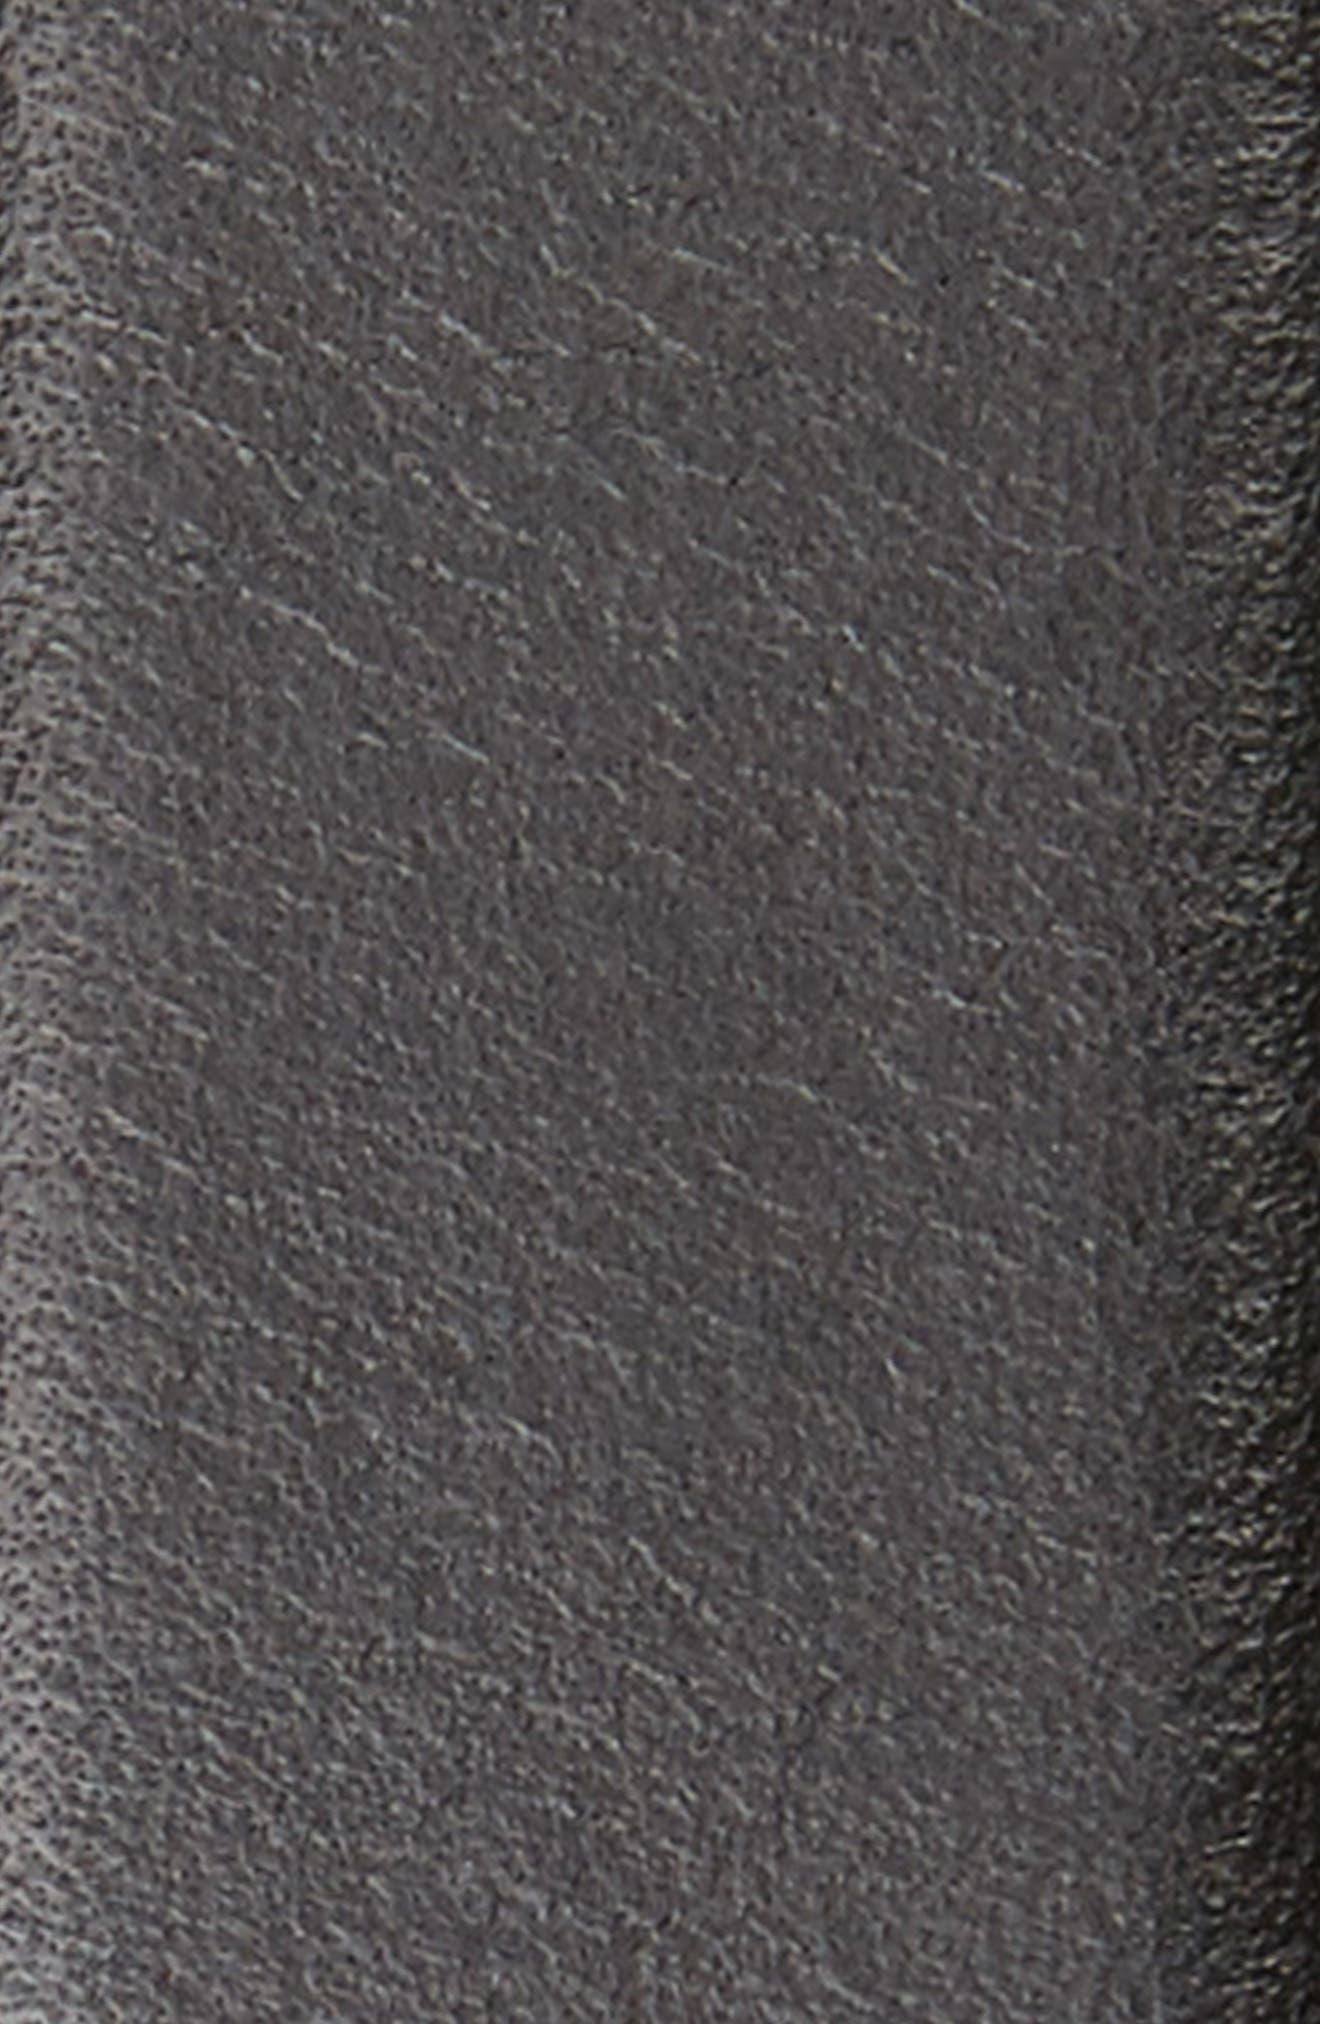 Carter Leather Dress Belt,                             Alternate thumbnail 2, color,                             Black